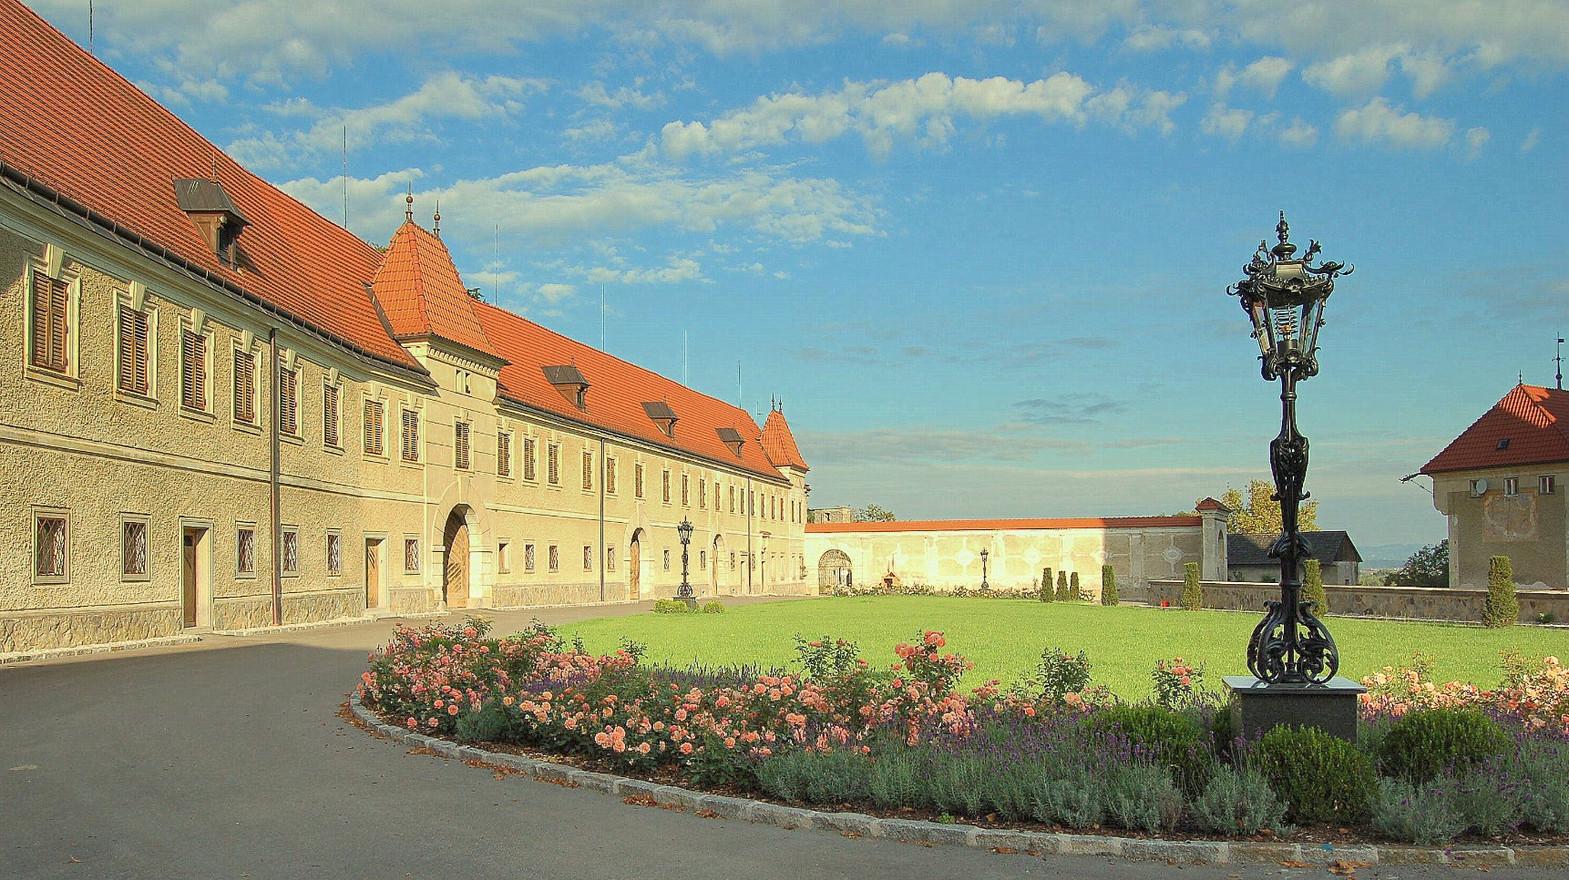 Wallsee castle (Austria)